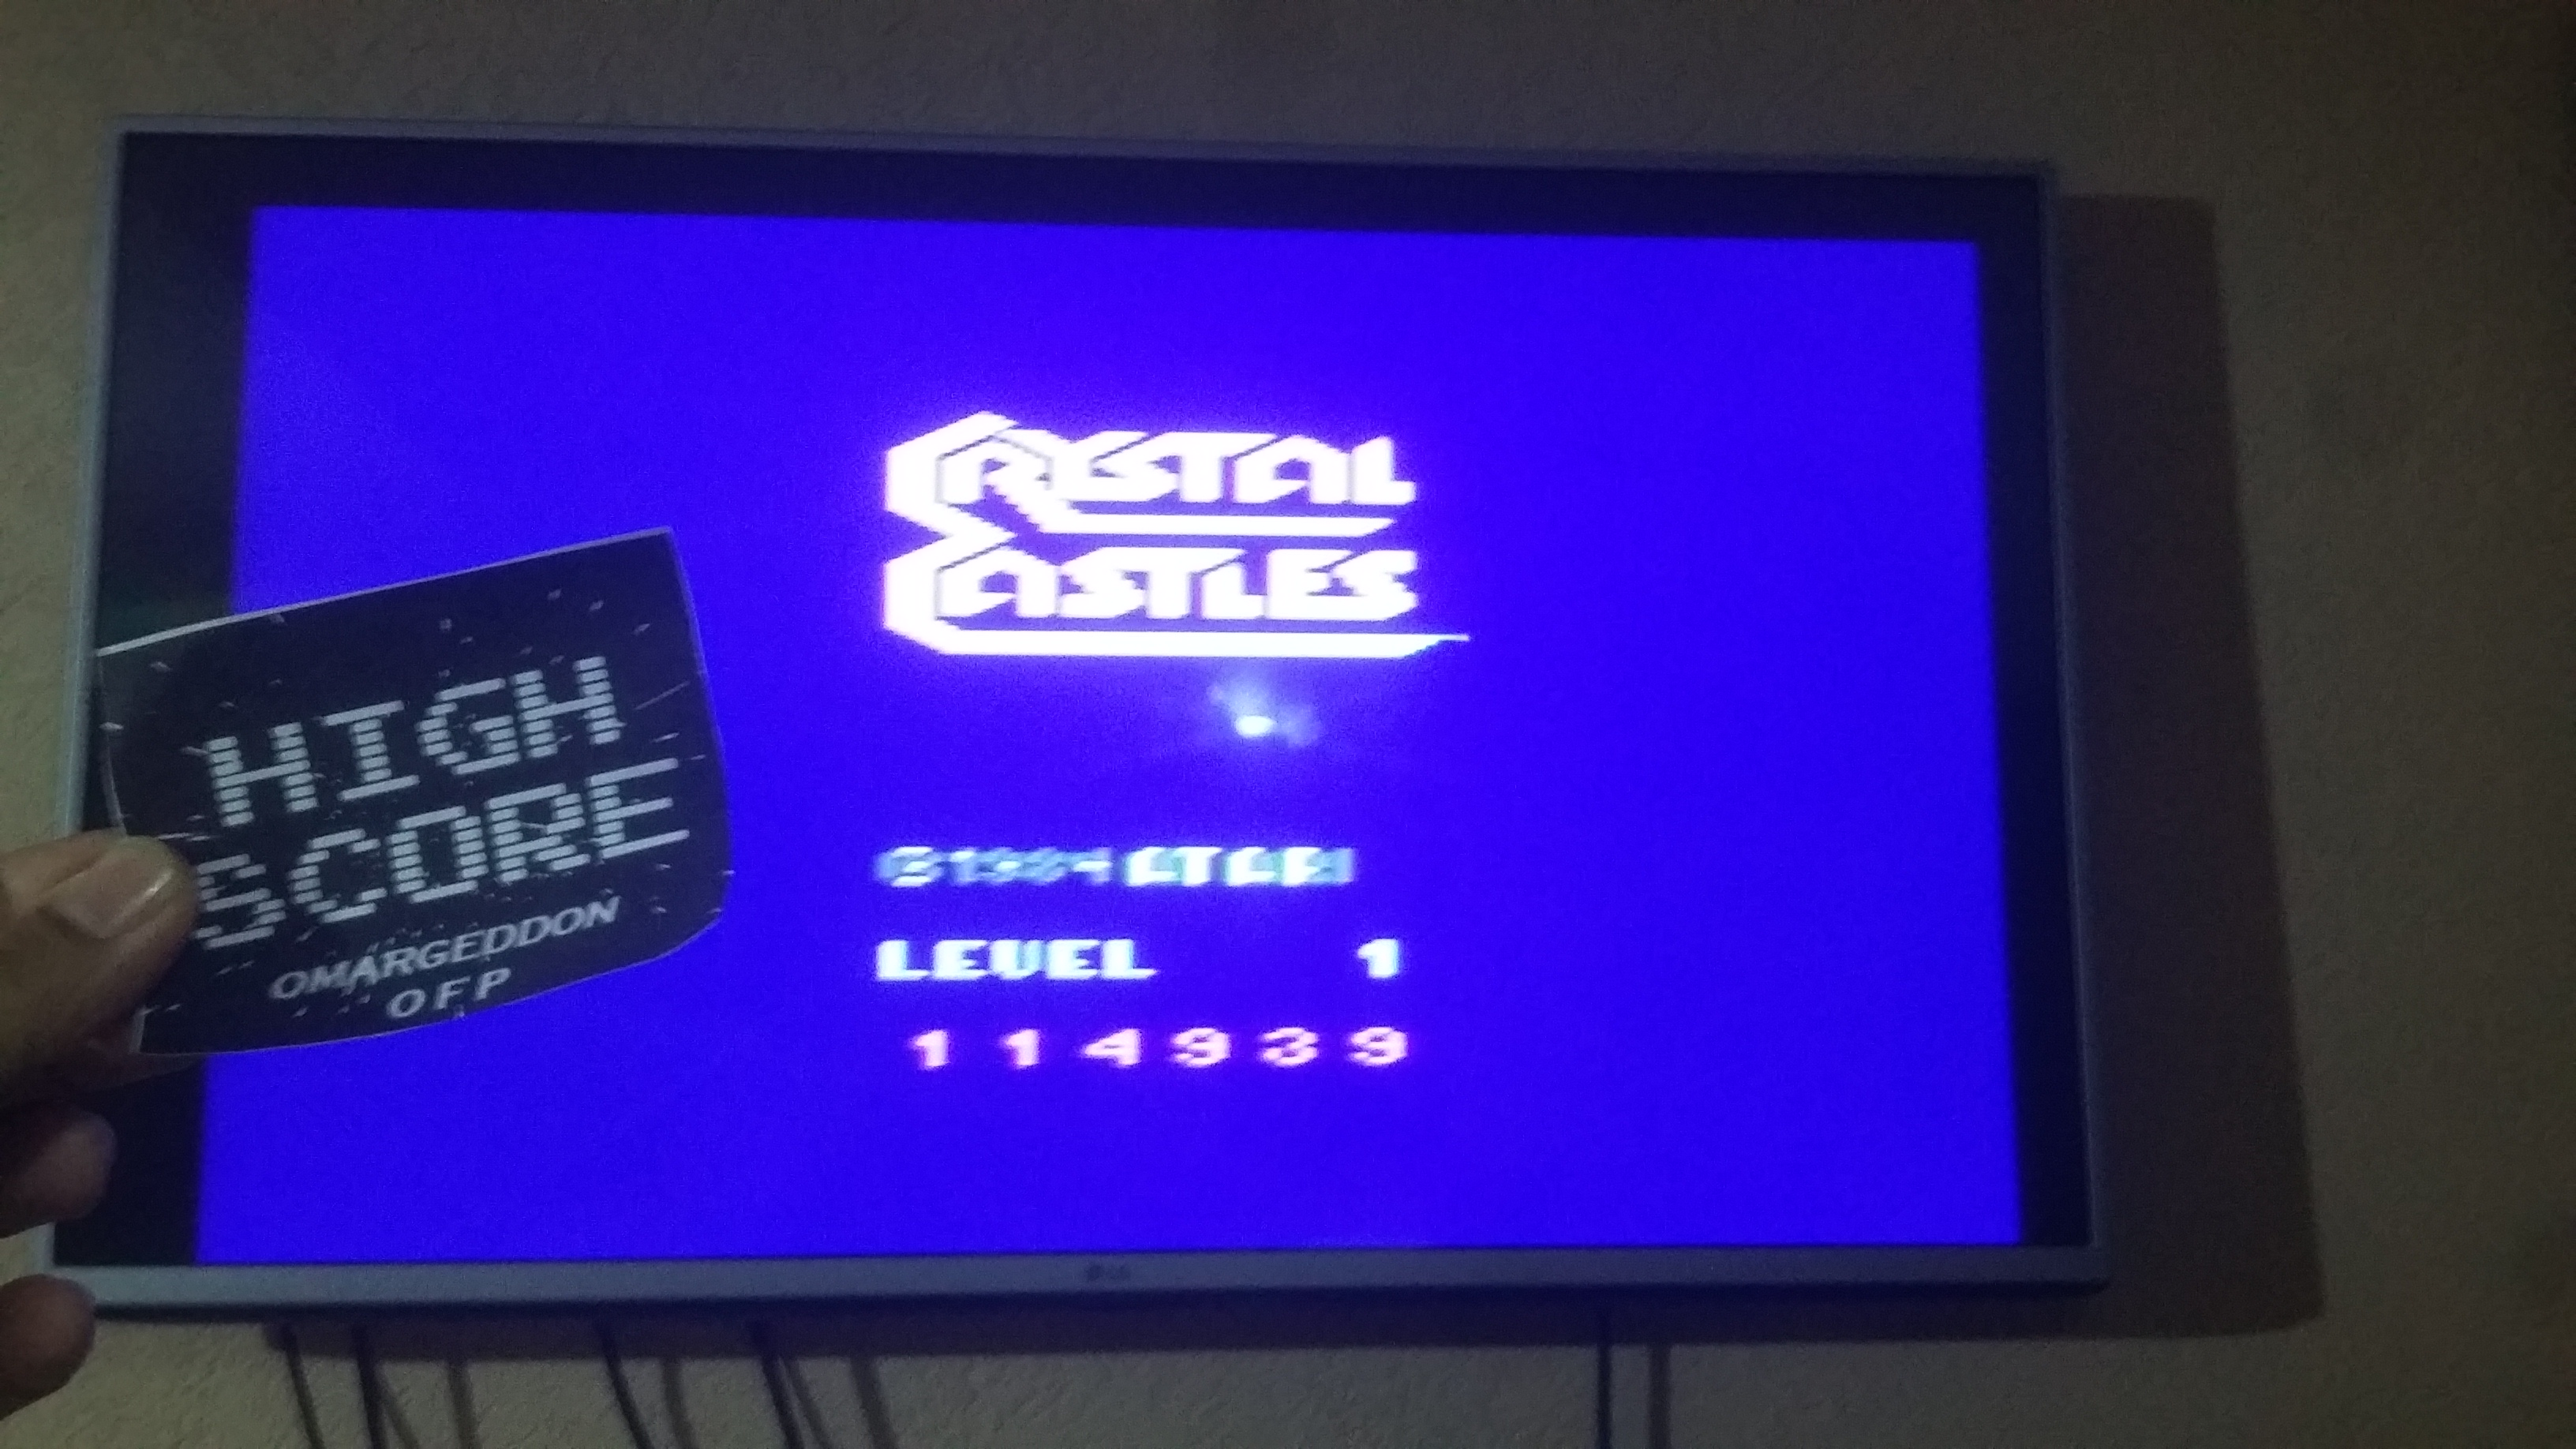 omargeddon: Crystal Castles (Atari 2600 Novice/B) 114,939 points on 2016-11-11 16:37:13